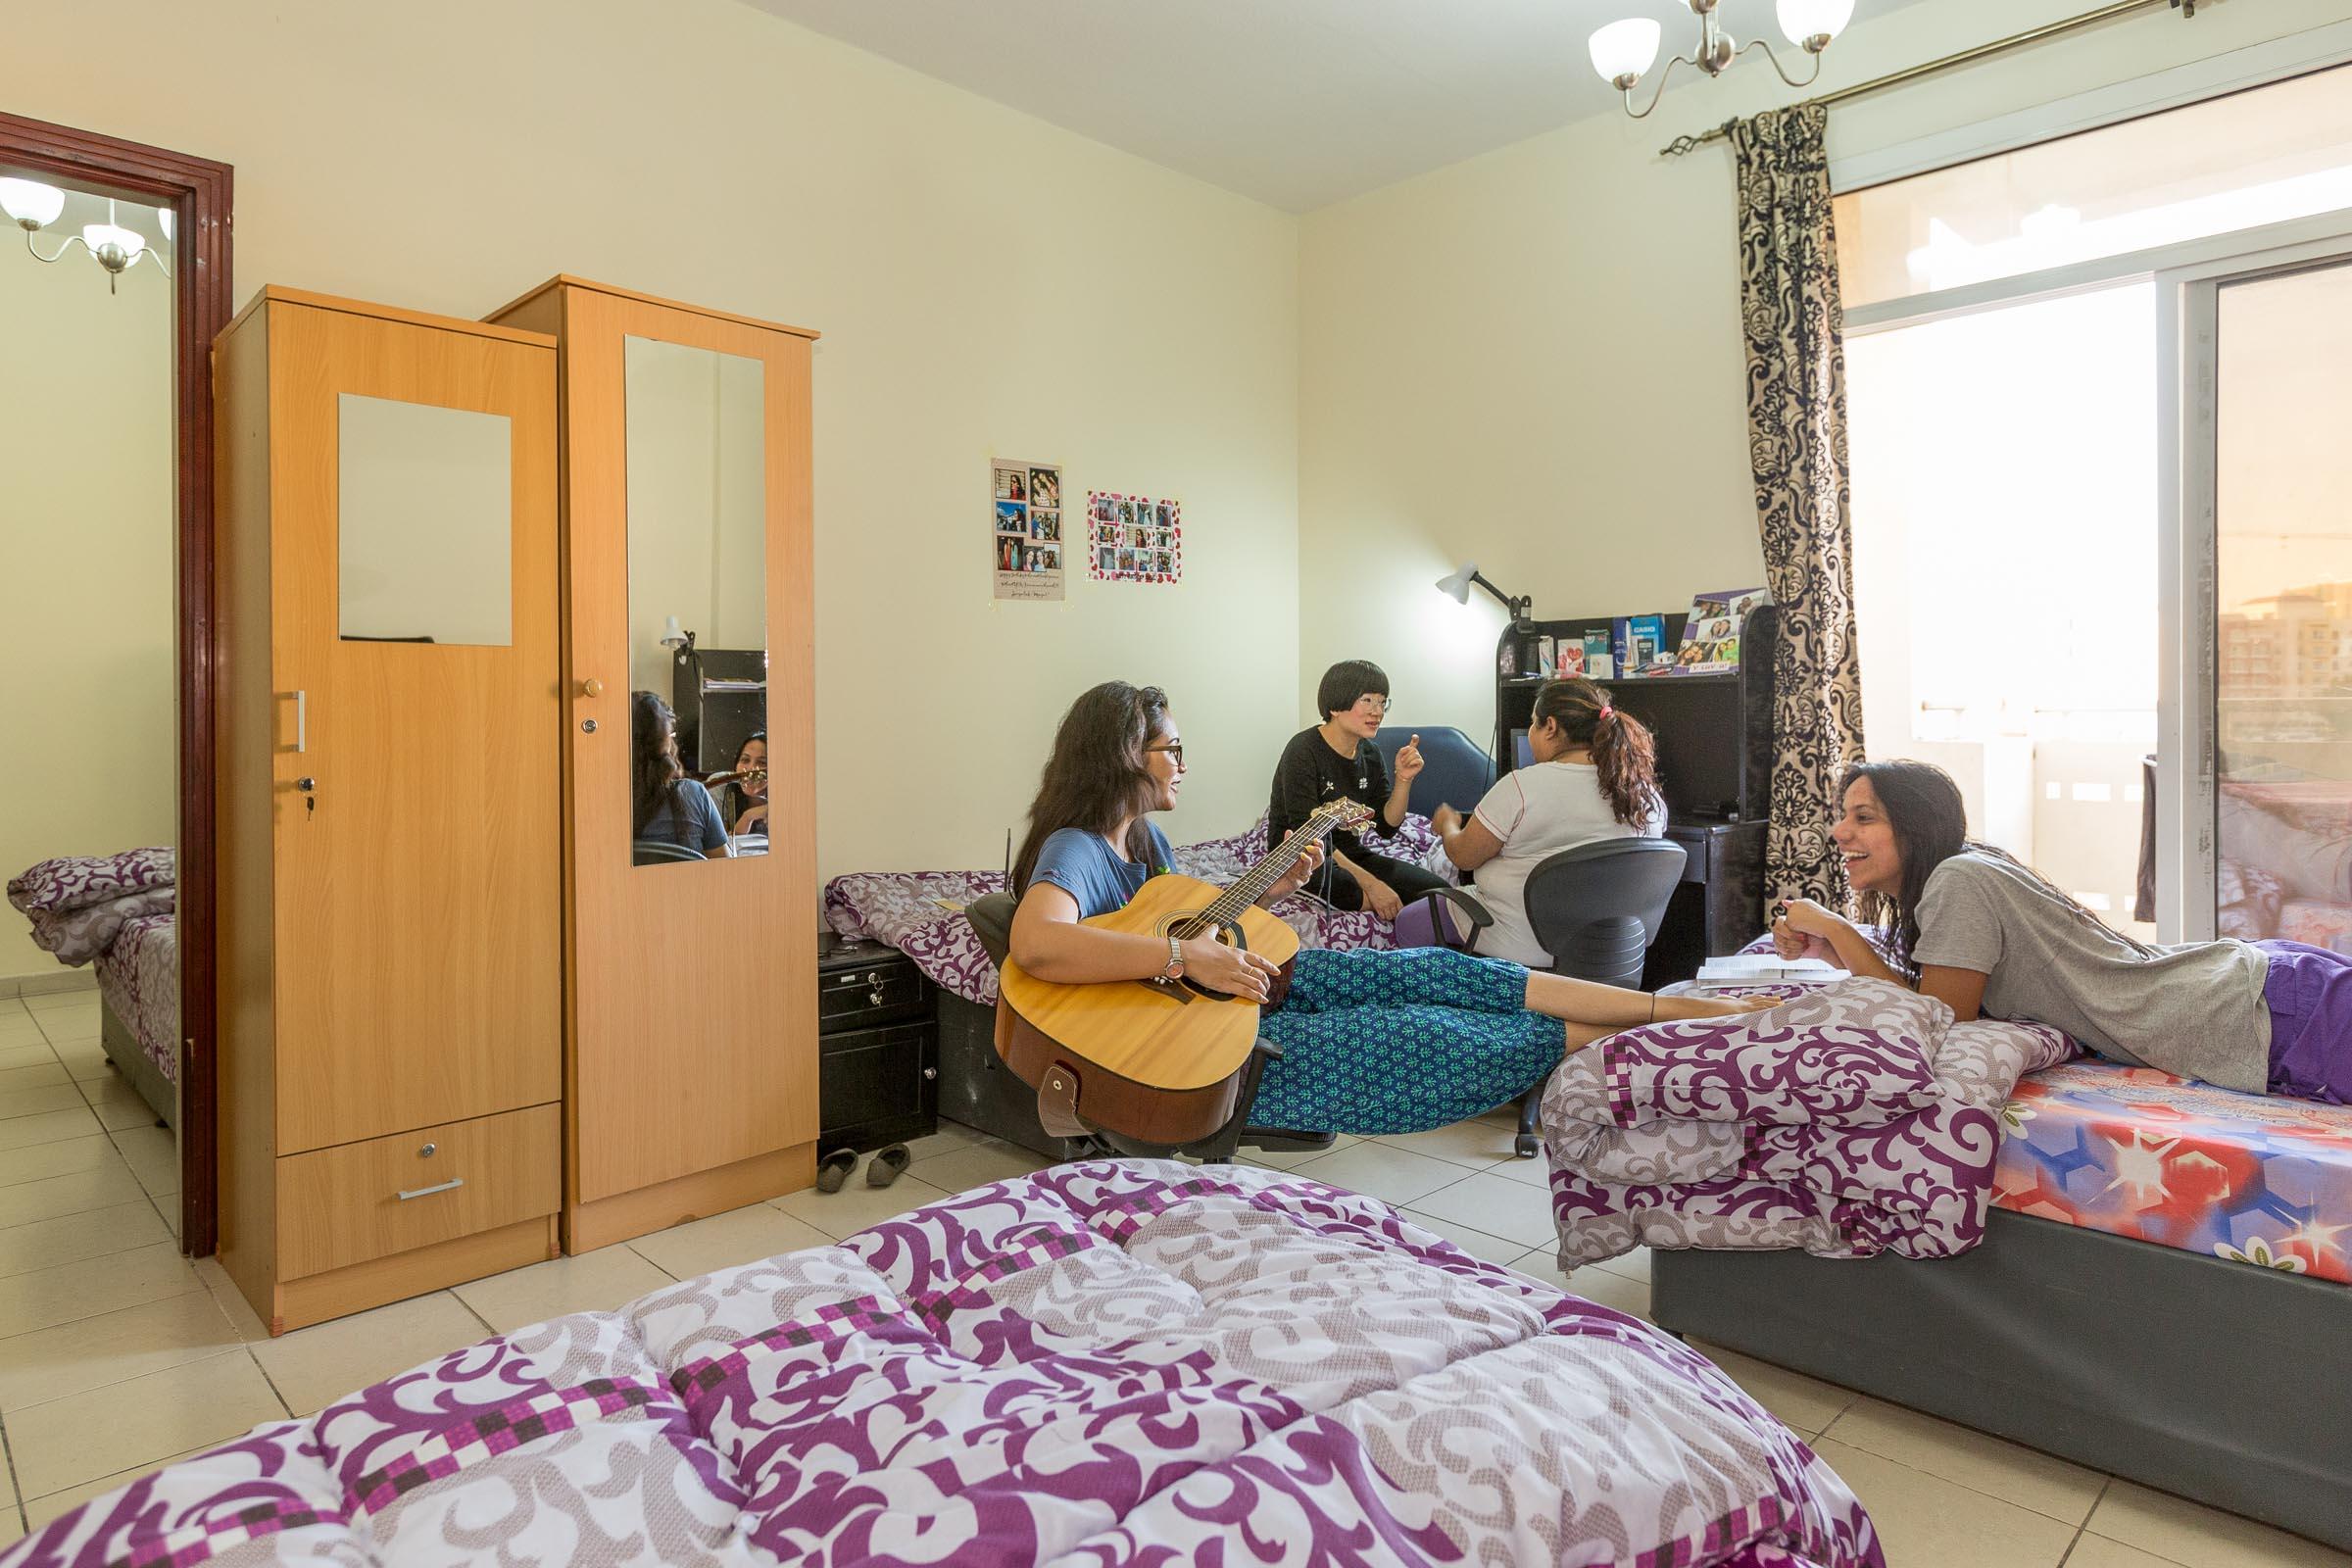 Dubai_accommodation_bedroom_2.jpg